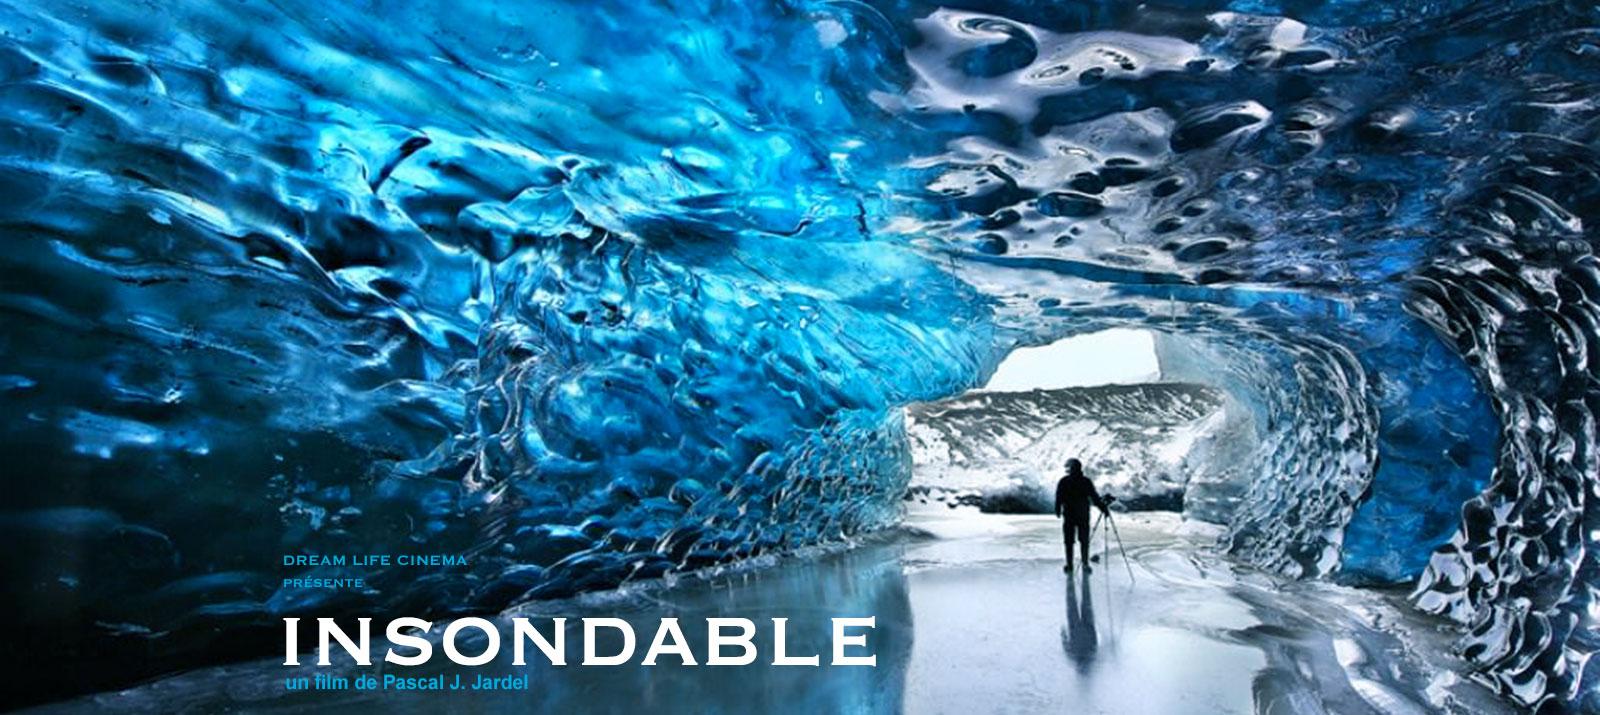 insondable_ice_affiche_film_pascal_j_jardel_dream_life_cinema